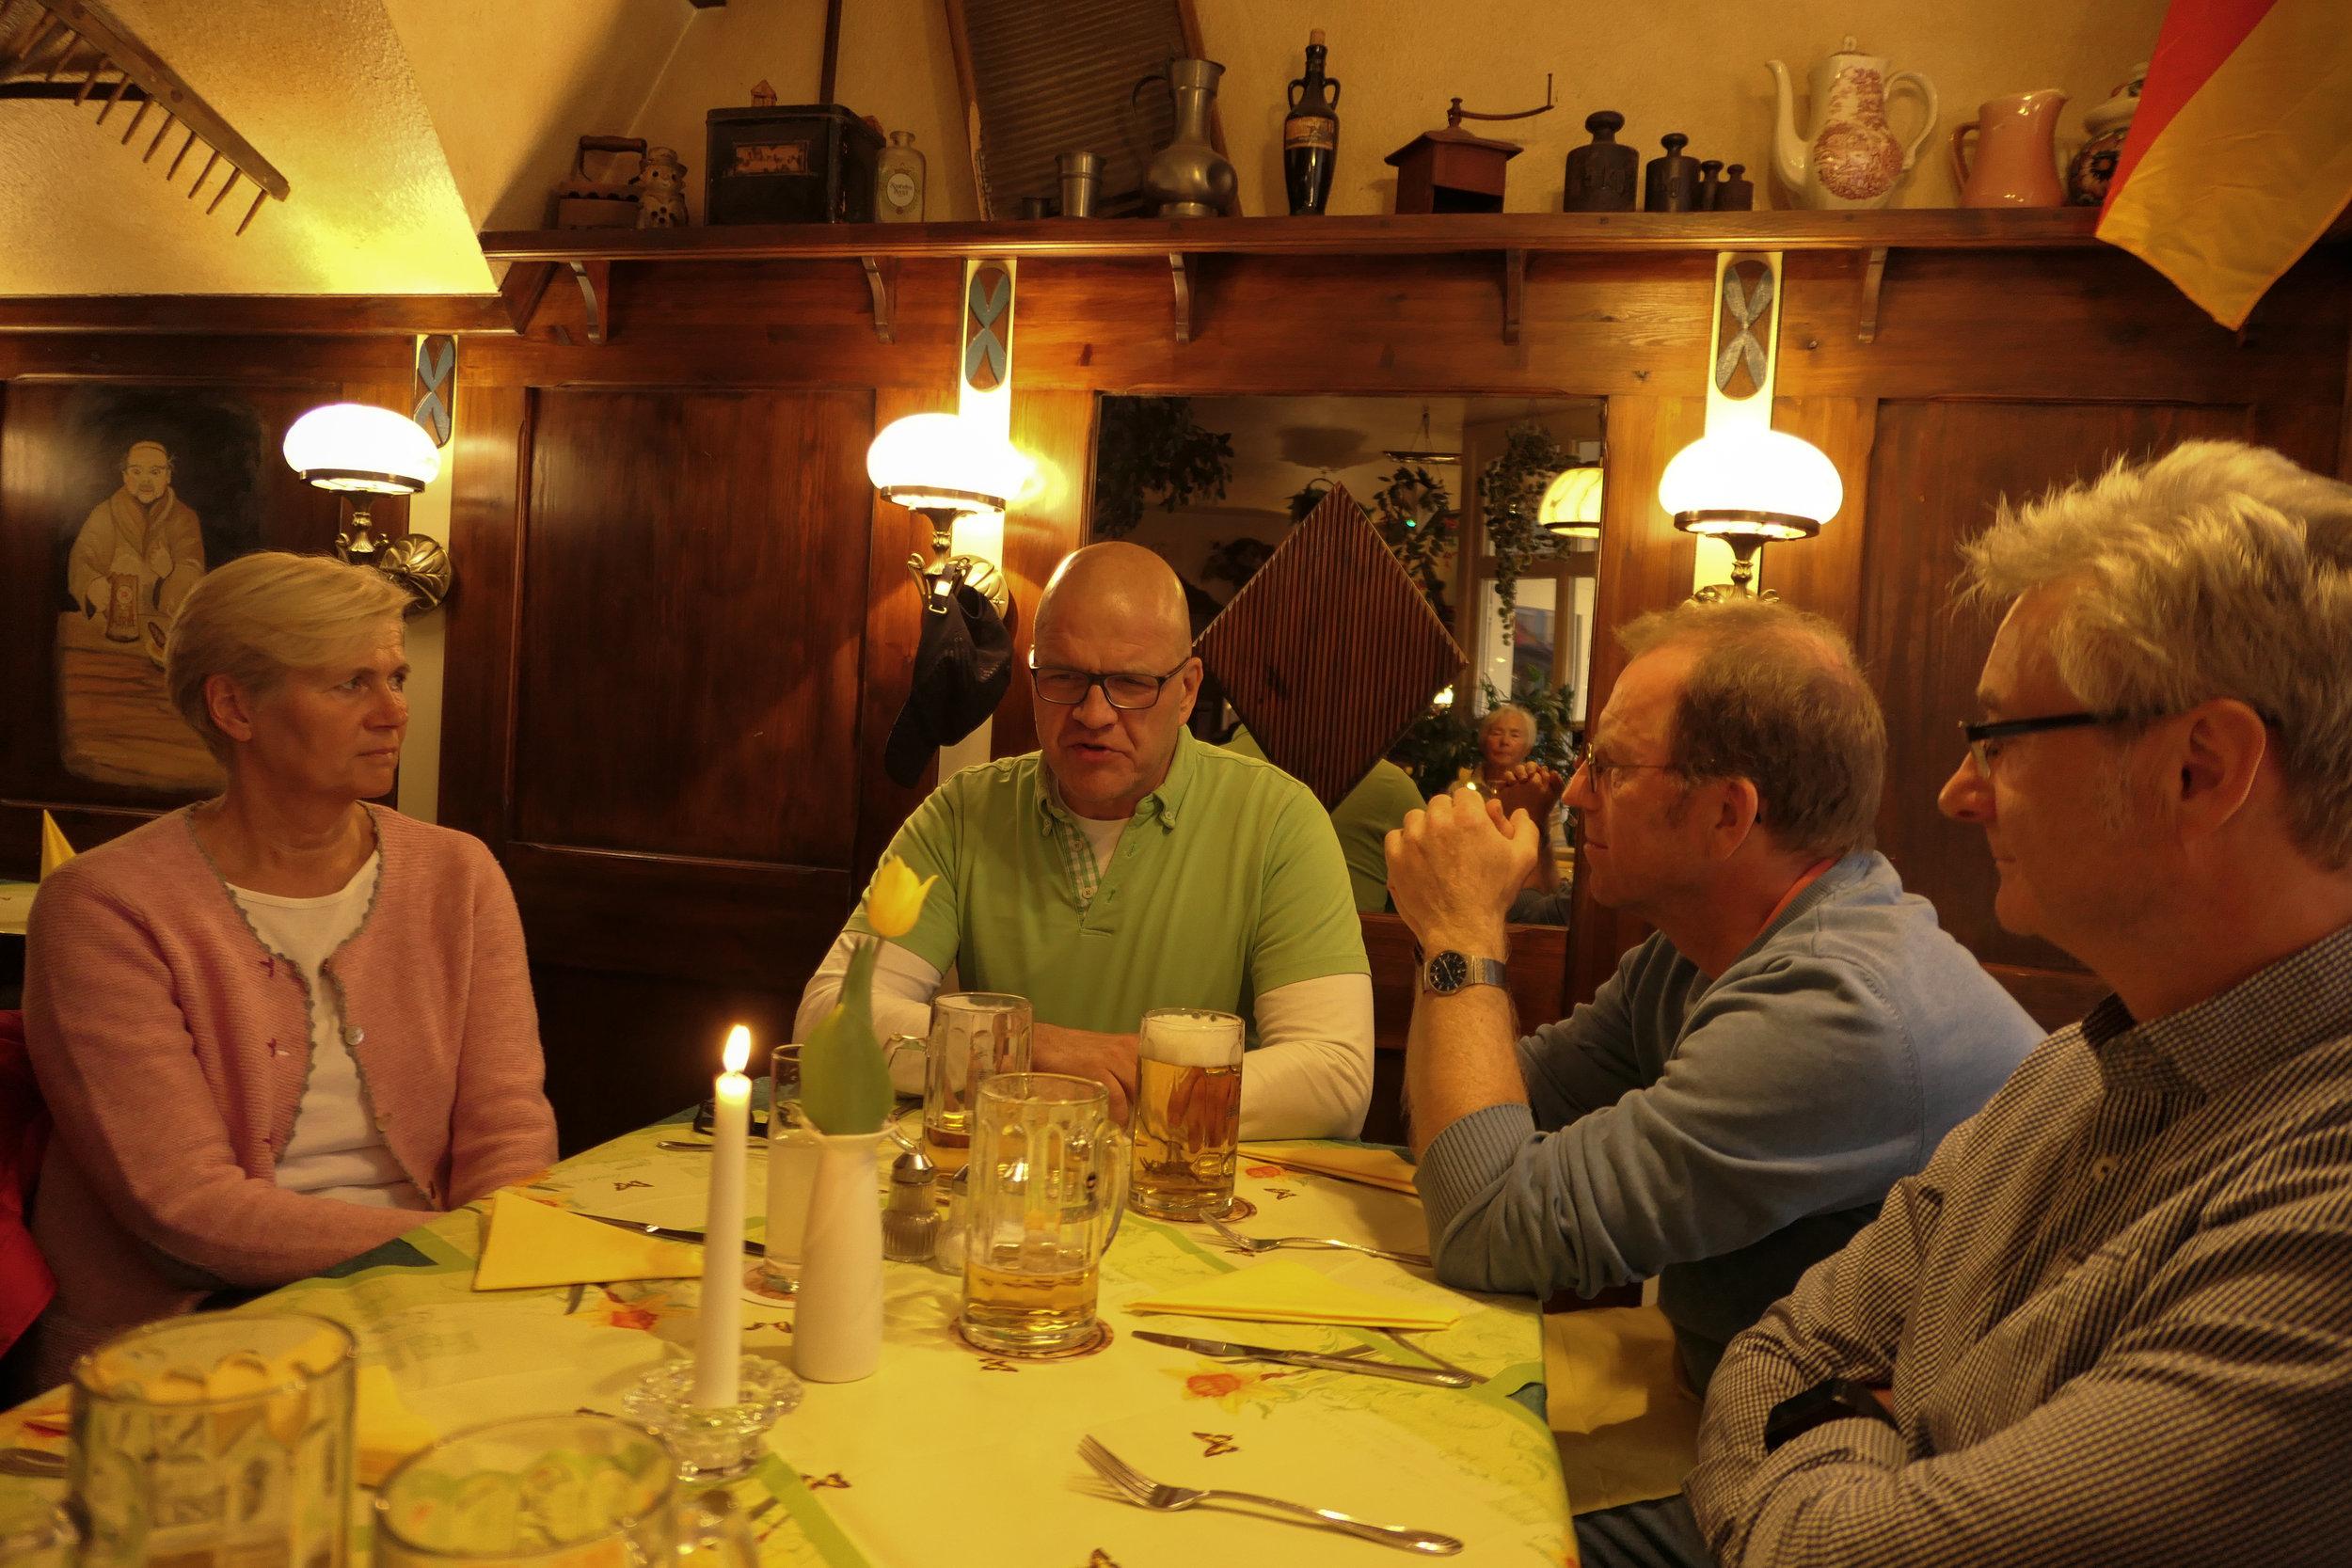 maiwanderfahrt-weser-2019-2_0155_2019-04-29_19-13-13.jpg